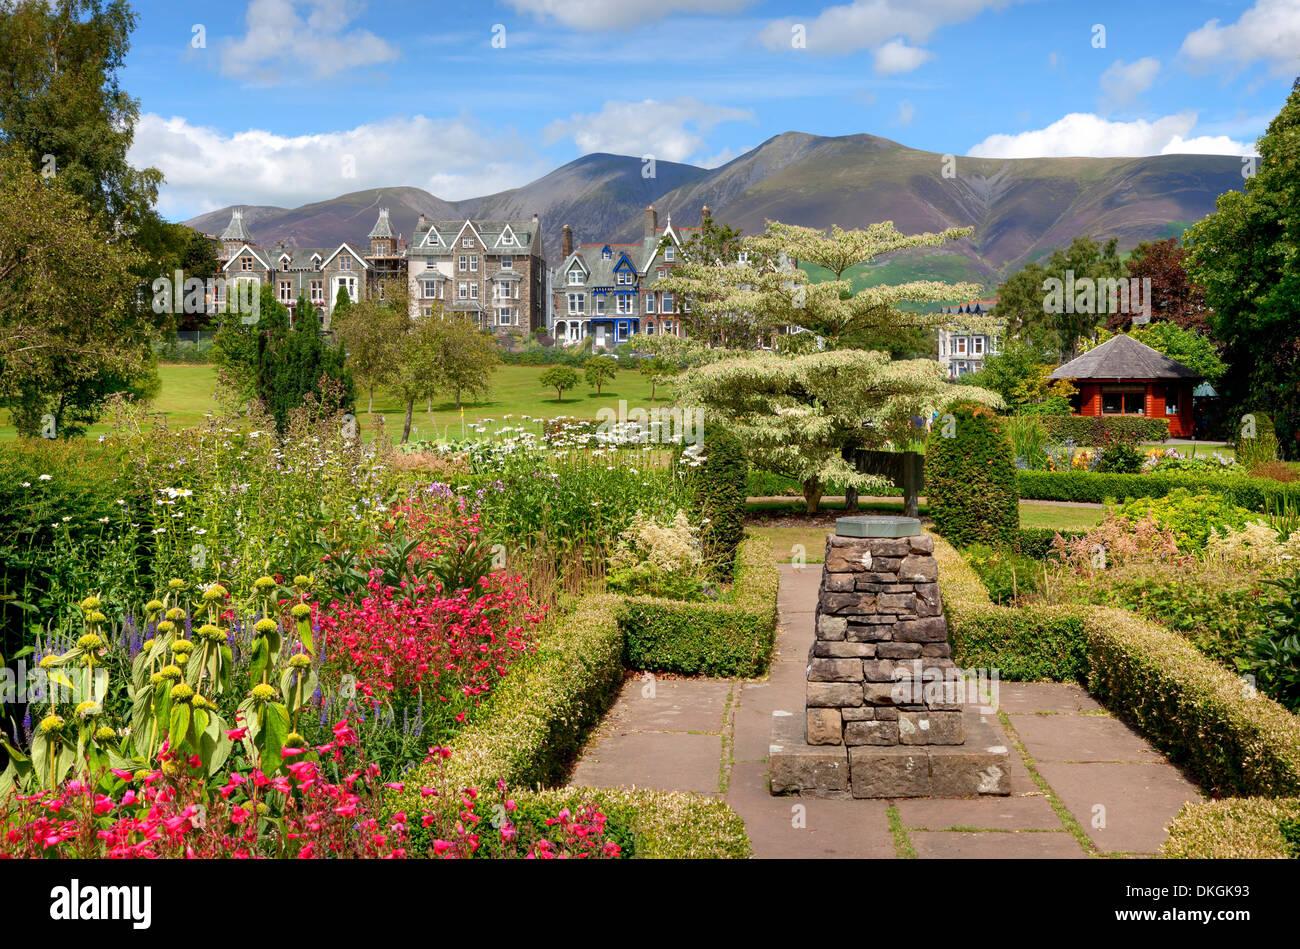 Hope Park, Keswick, the Lake District, Cumbria, England. - Stock Image